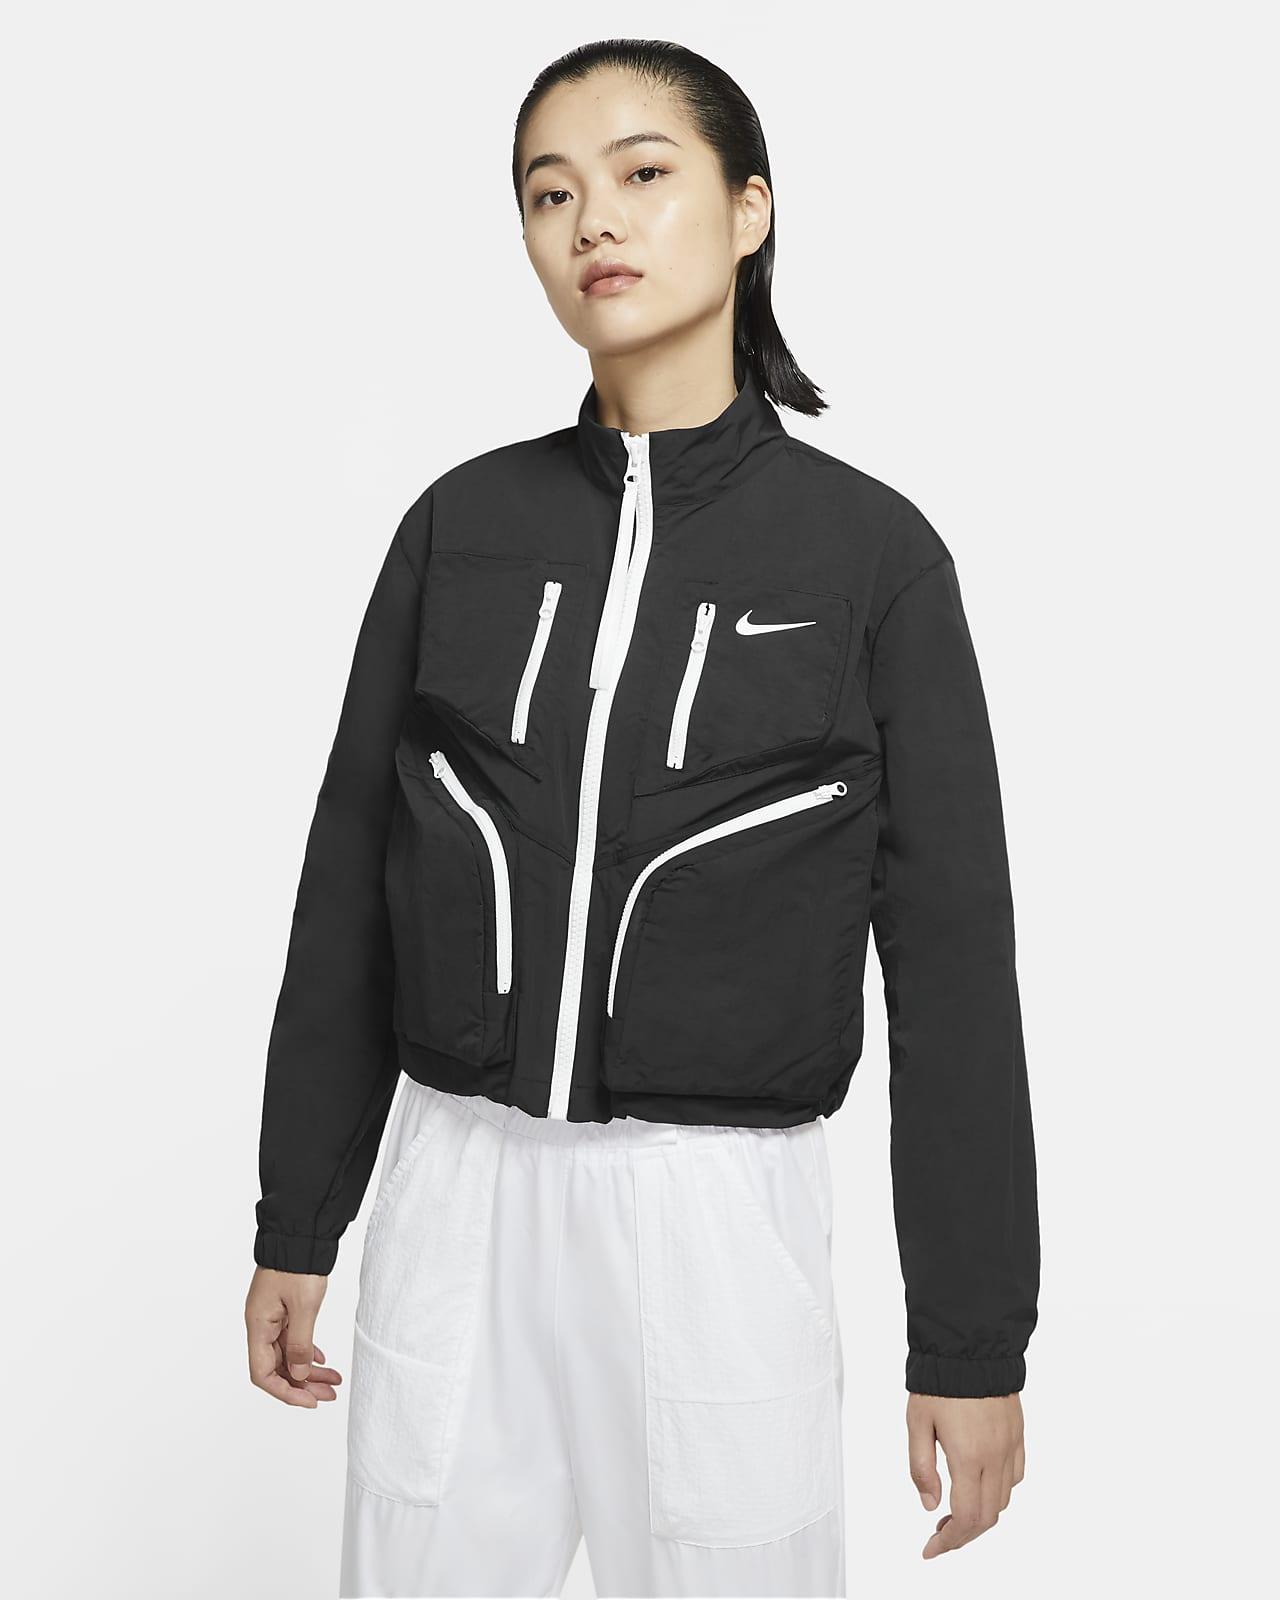 Chamarra tejida para mujer Nike Sportswear Tech Pack